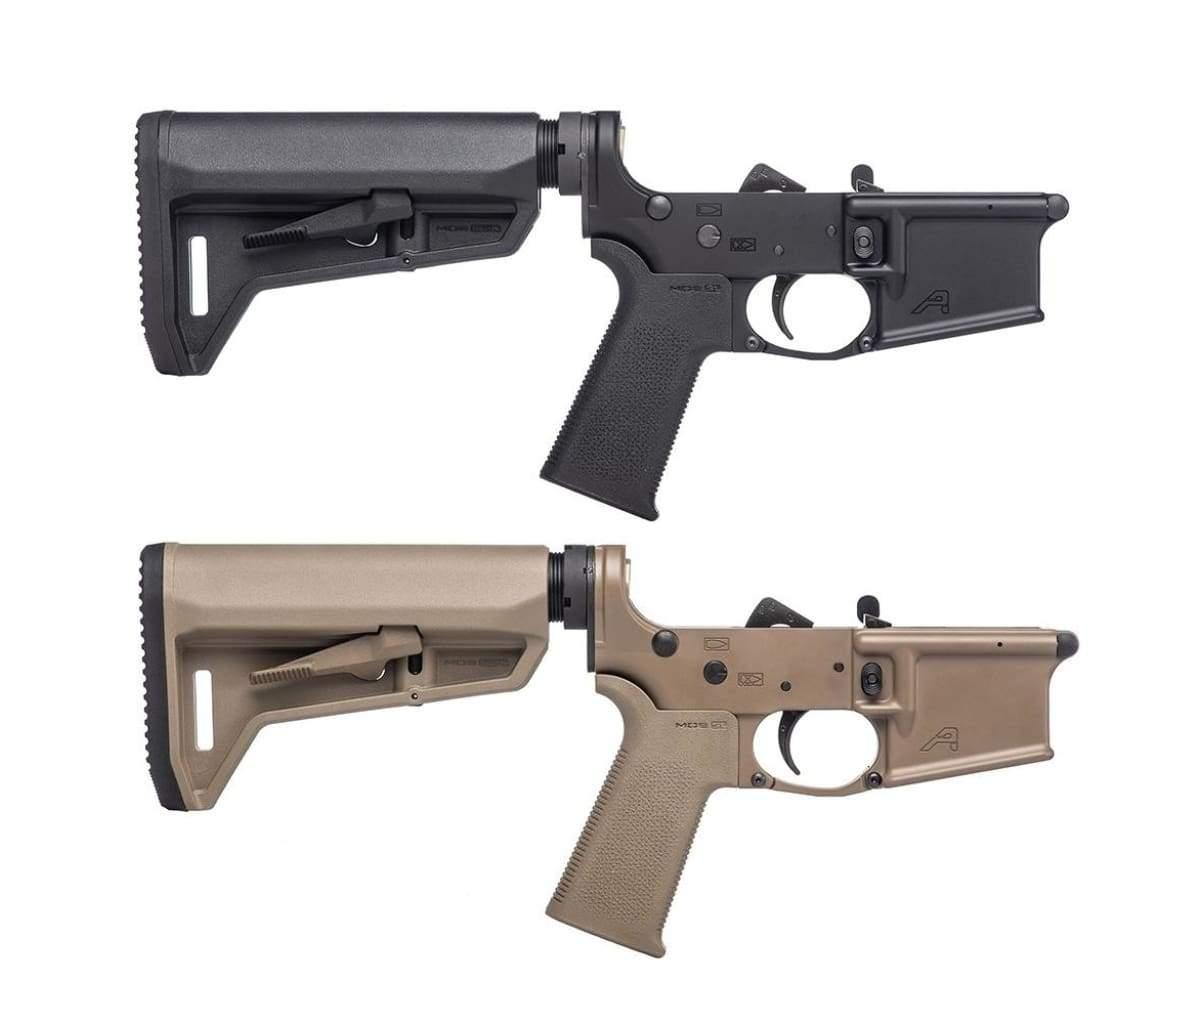 Aero Precision AR-15 Complete Lower Receiver w/ MOE SL Grip & SL-K Carbine  Stock